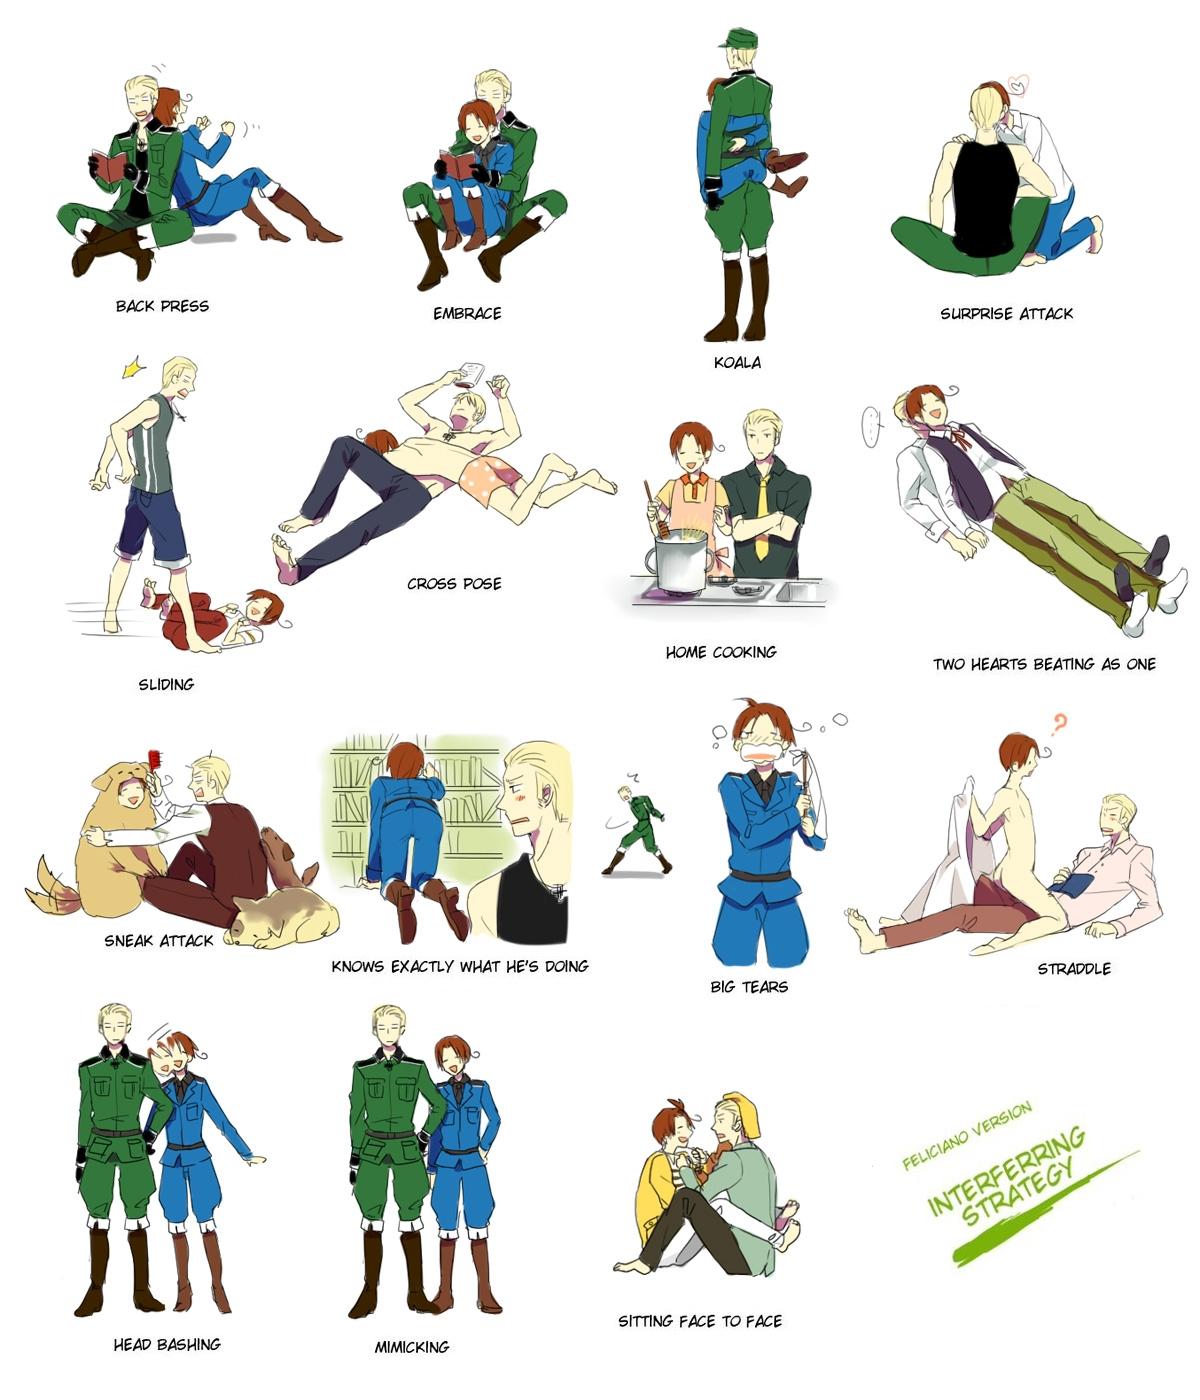 Photo post wed sep 21 2011 456 notes